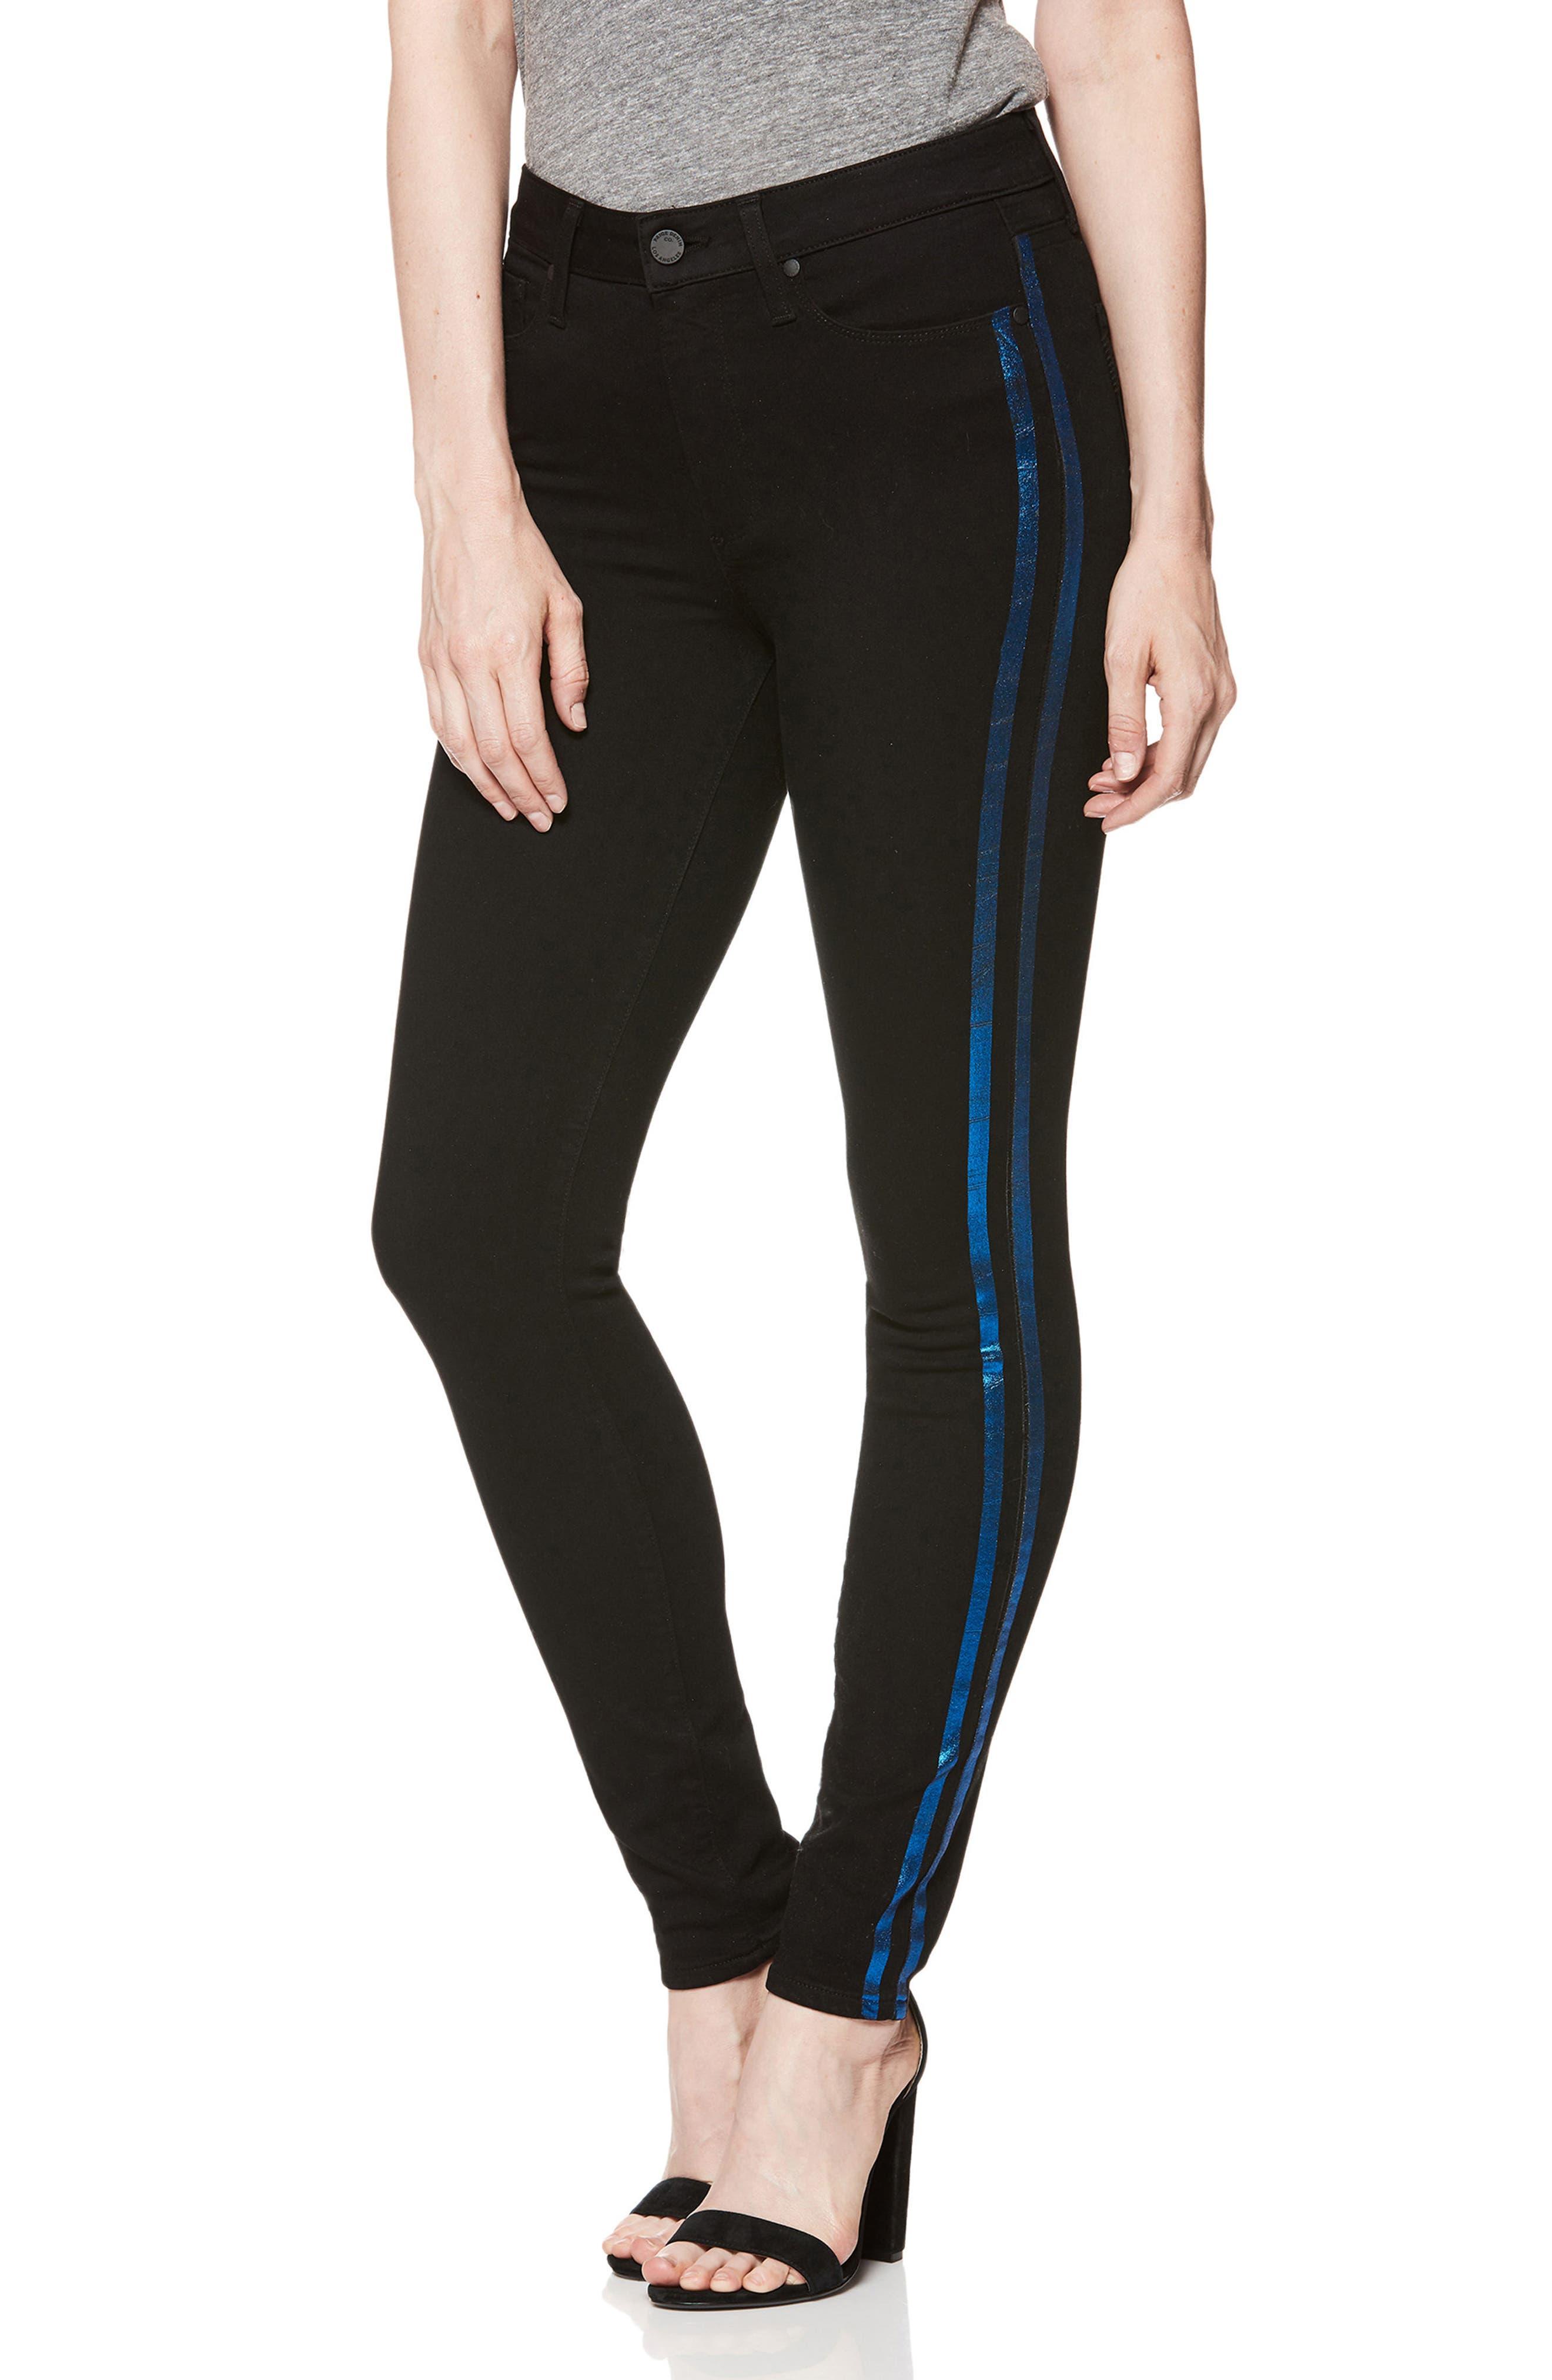 Transcend - Hoxton High Waist Ultra Skinny Jeans,                         Main,                         color, BLACK SHADOW W/ BLUE